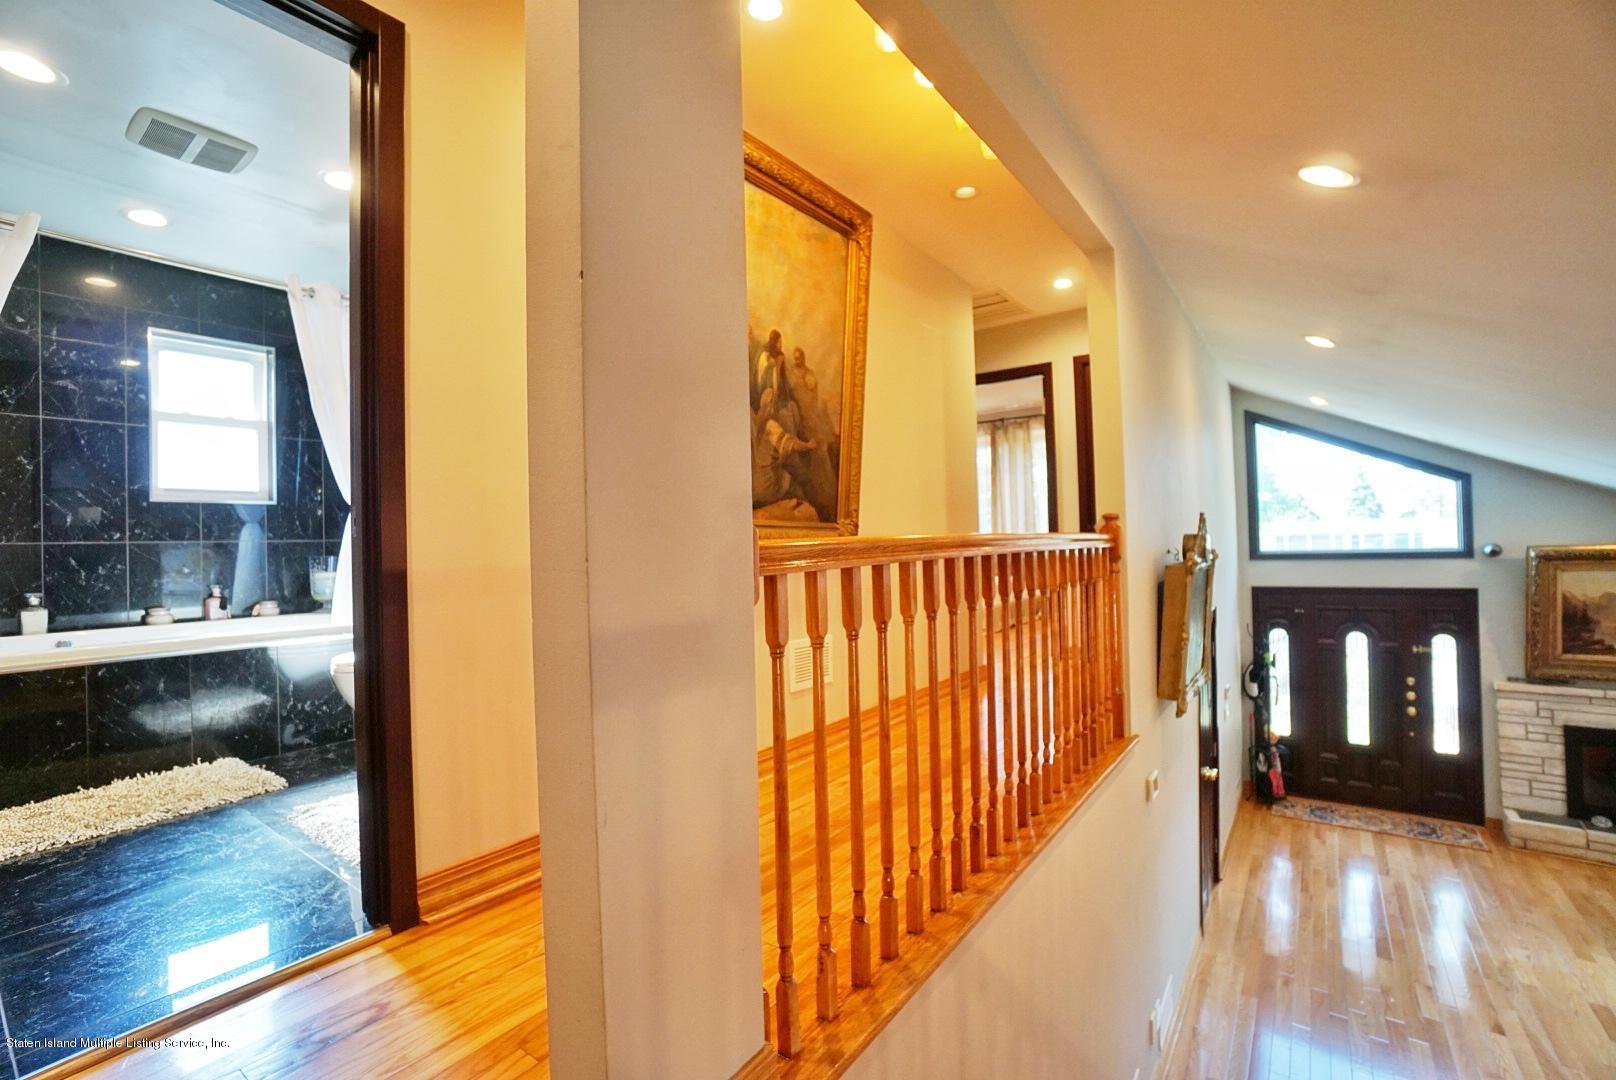 Single Family - Detached 48 Ocean Terrace  Staten Island, NY 10314, MLS-1130826-40